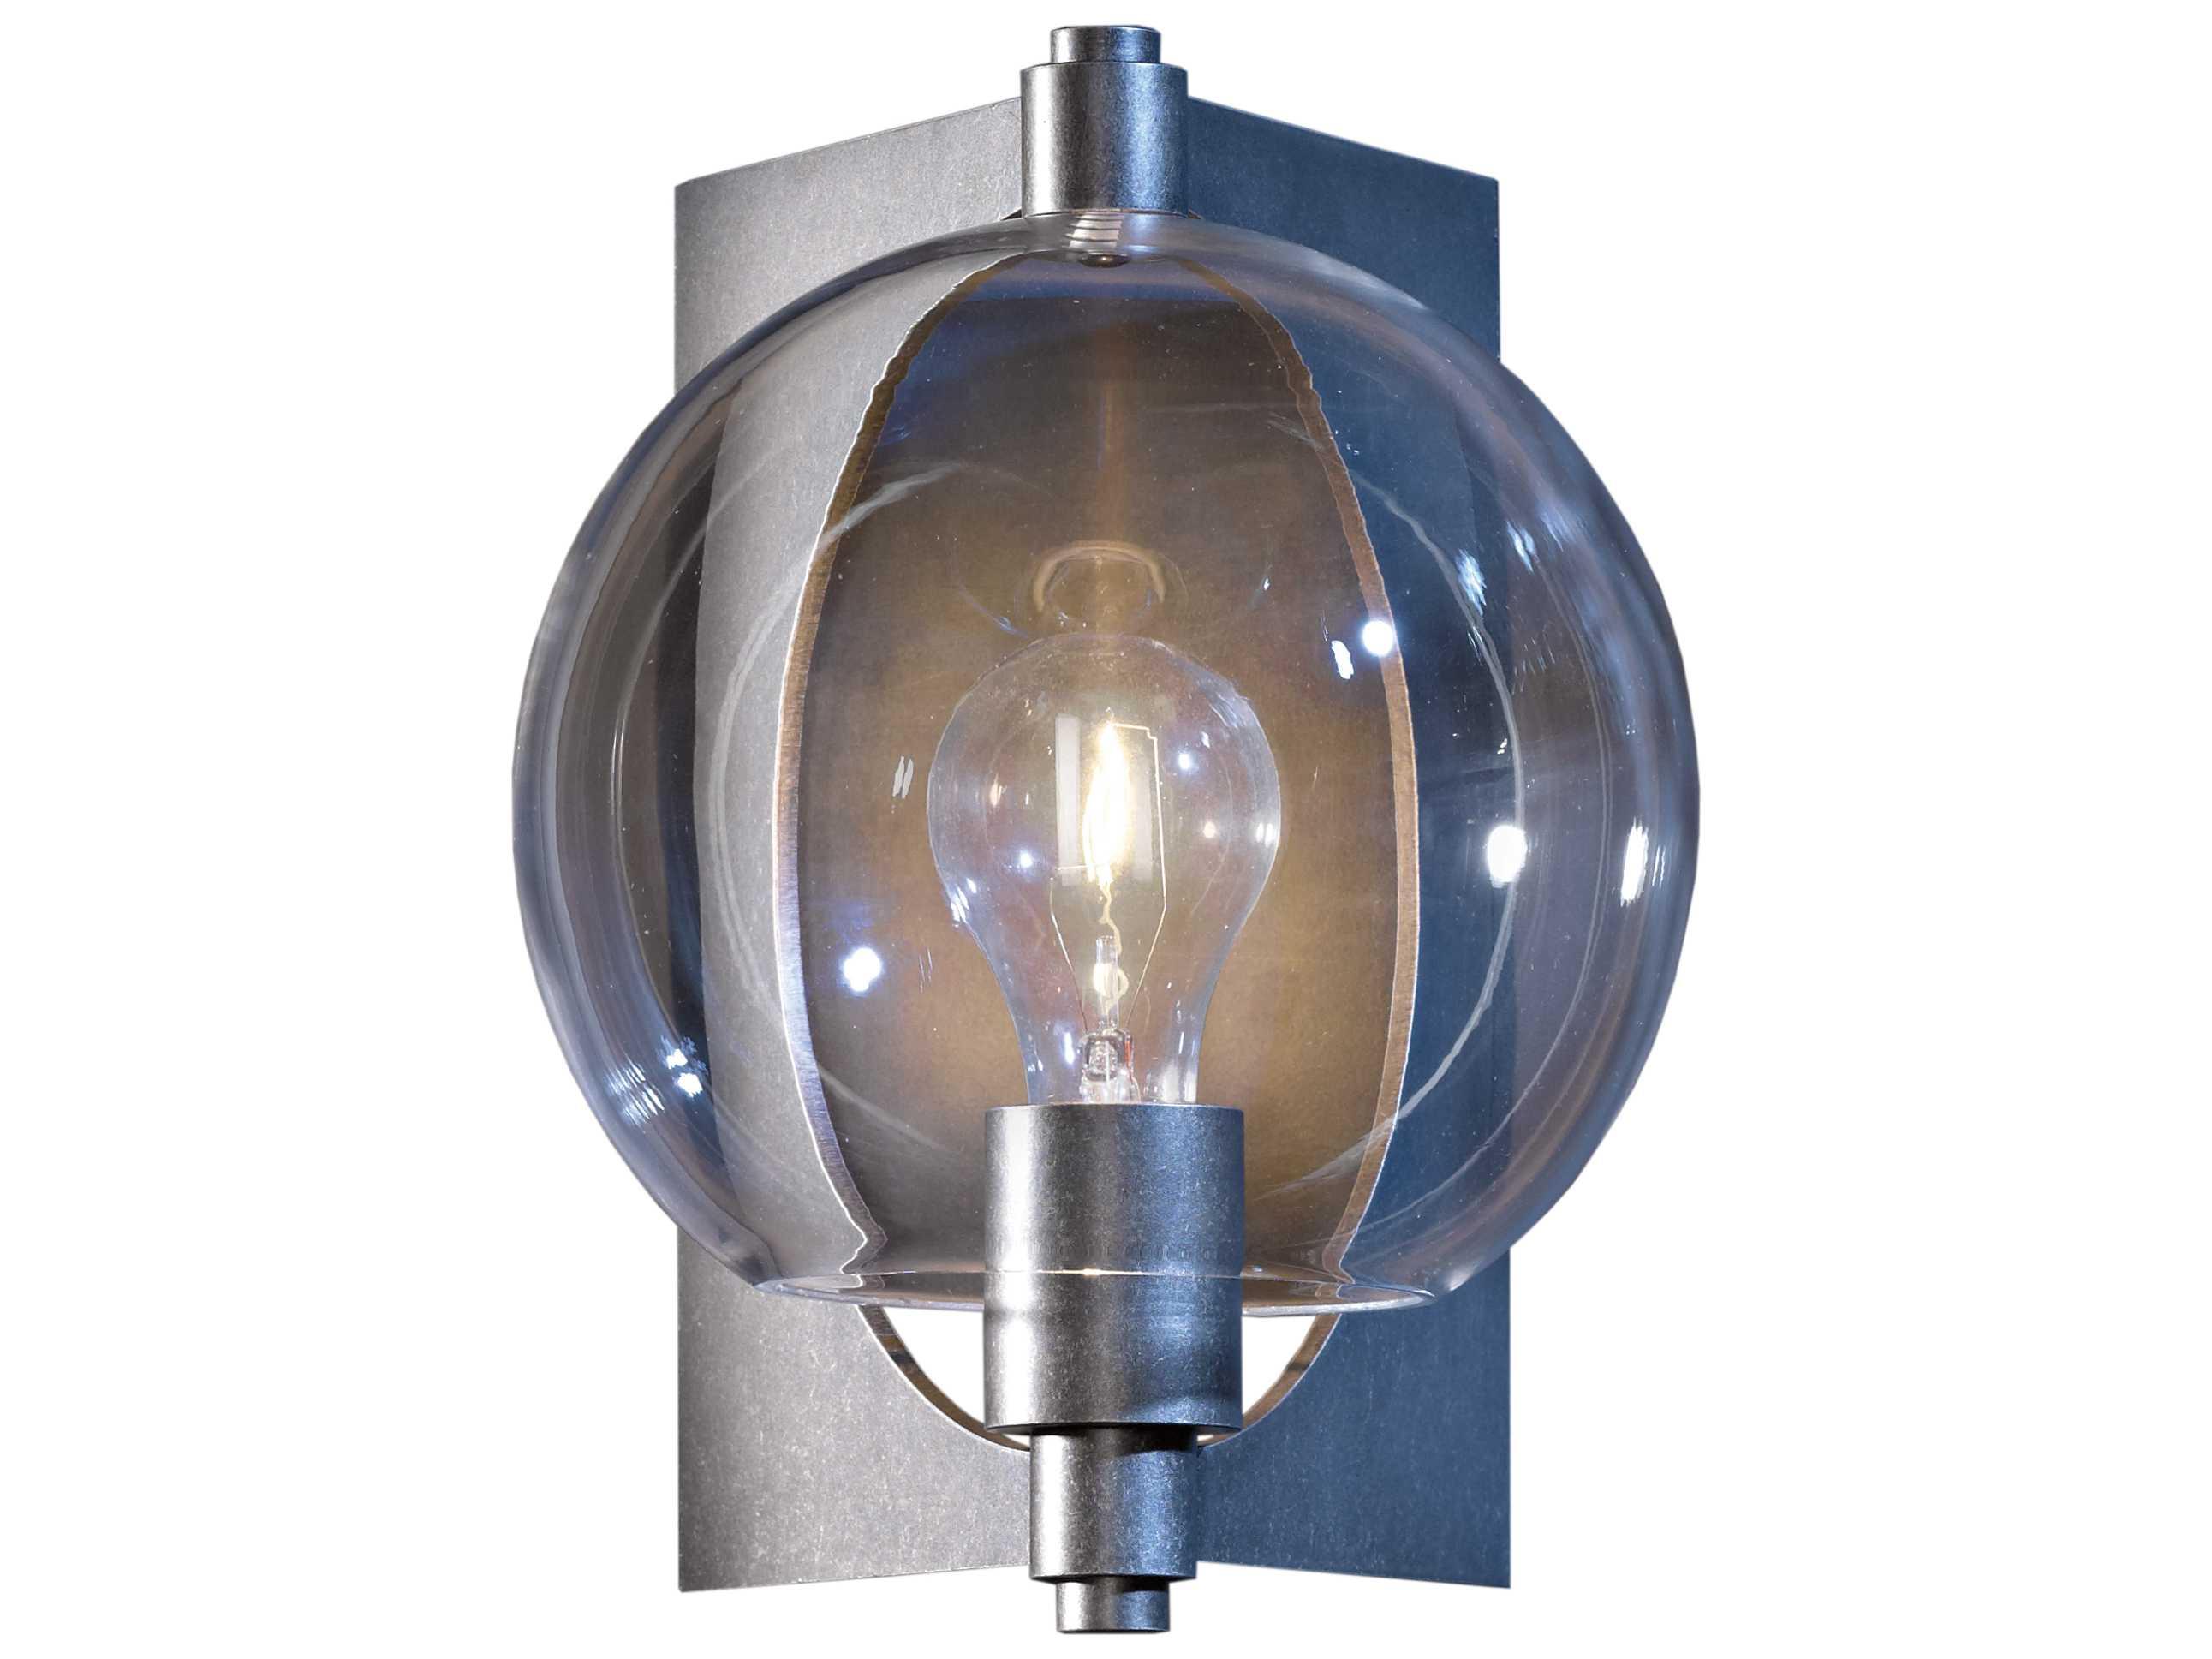 Hubbardton Forge Pluto Incandescent Outdoor Wall Light Hbf306603